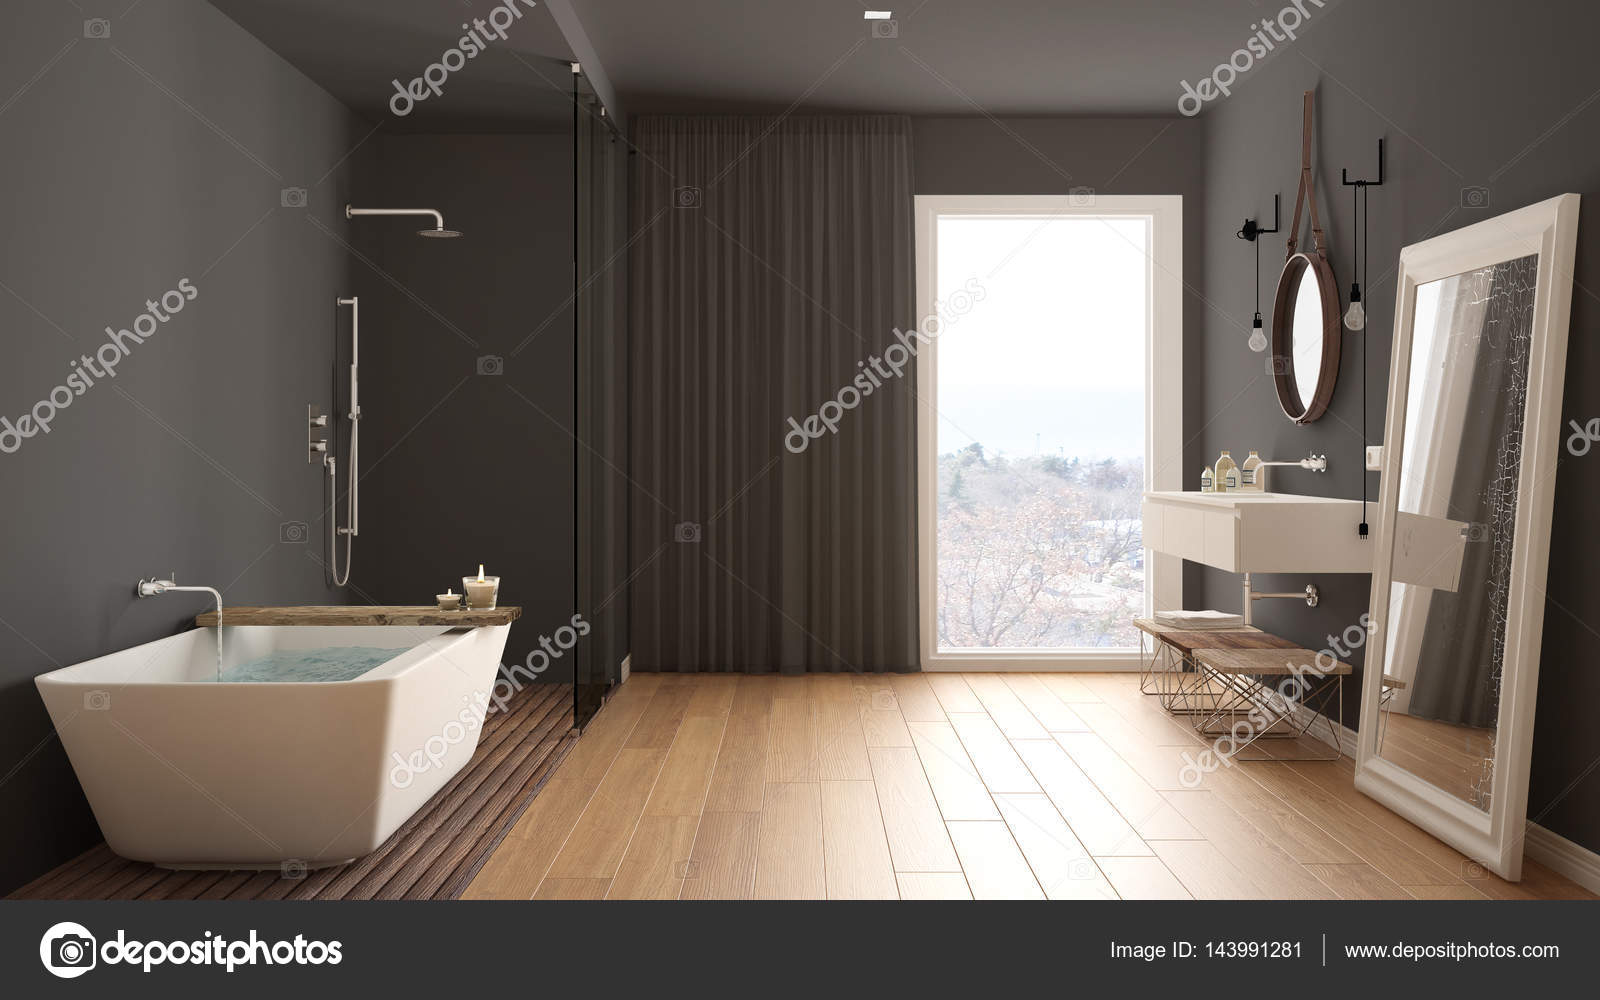 Modern interieur van een badkamer met showe stockfoto moderne